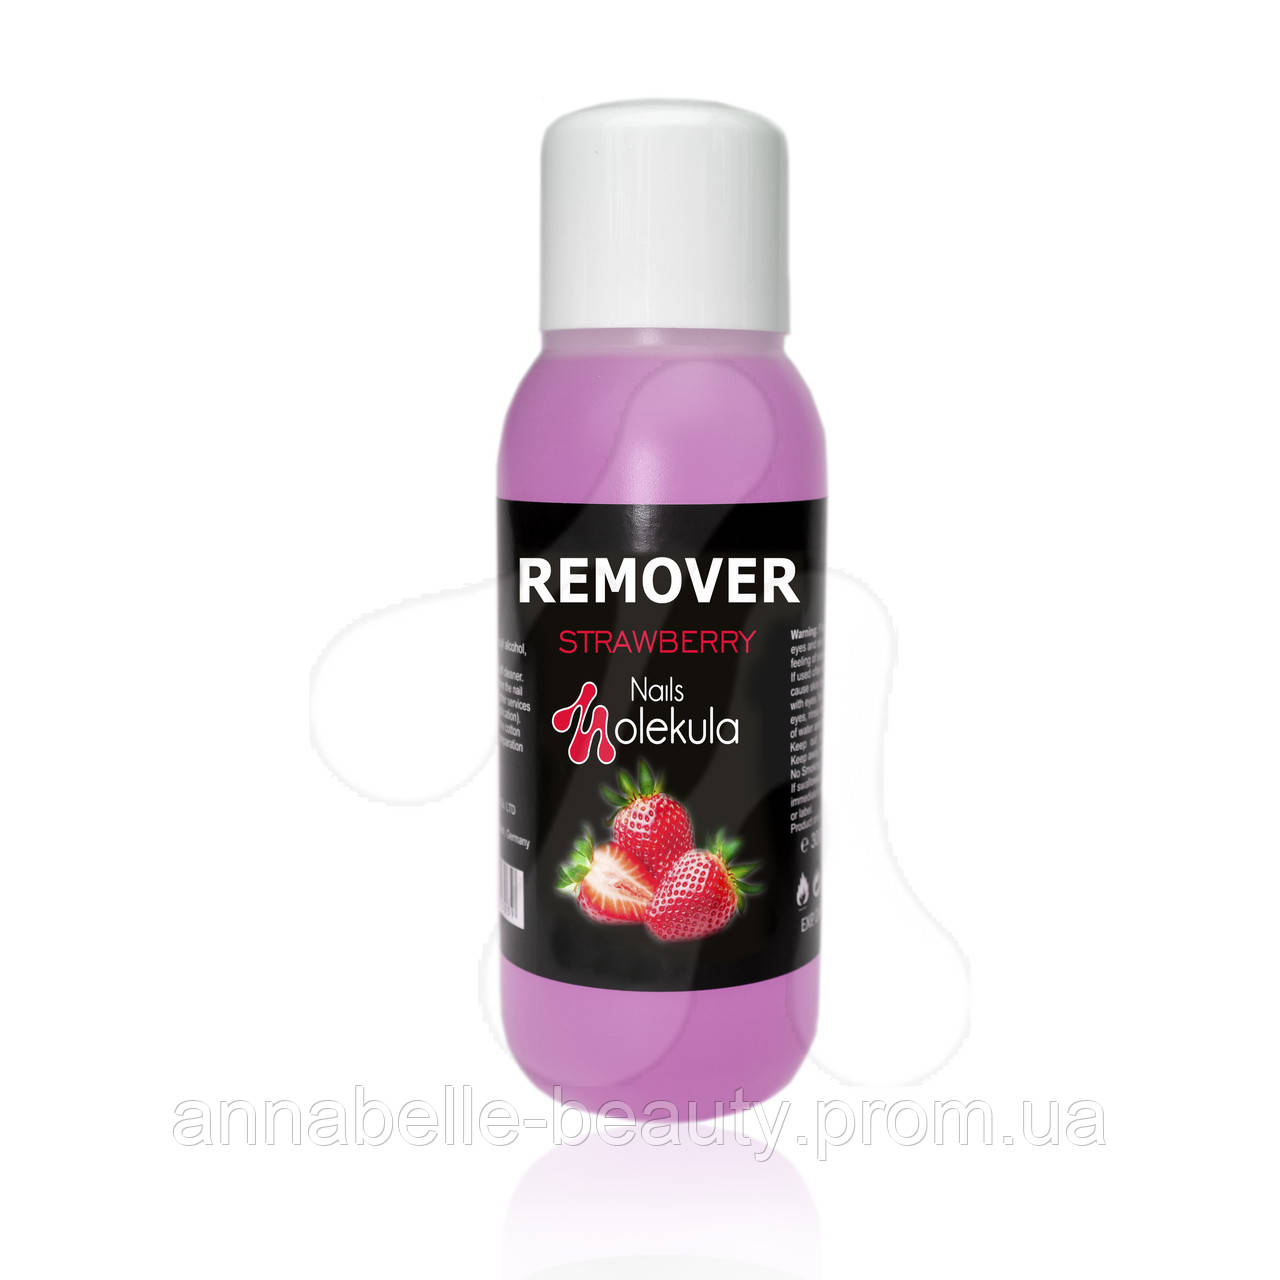 Remover - средство для снятия гель-лака и биогеля 300мл STRAWBERRY (клубника)